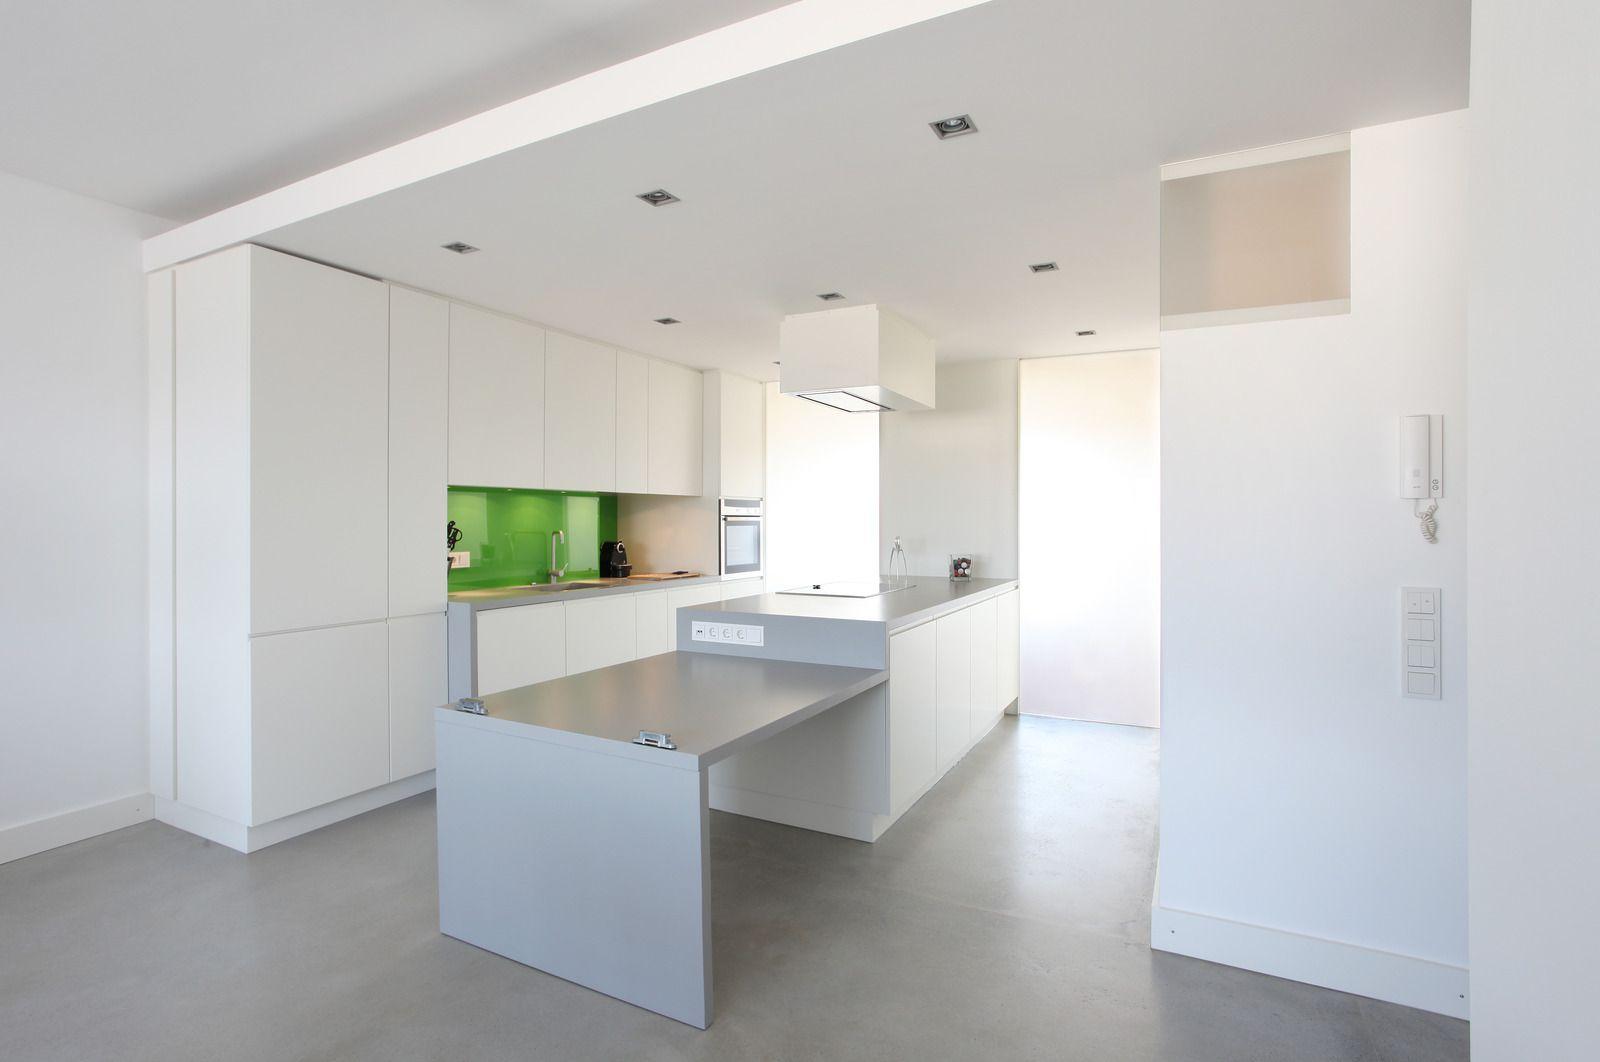 Modern Suspended Ceiling Apartment Kitchen Interior